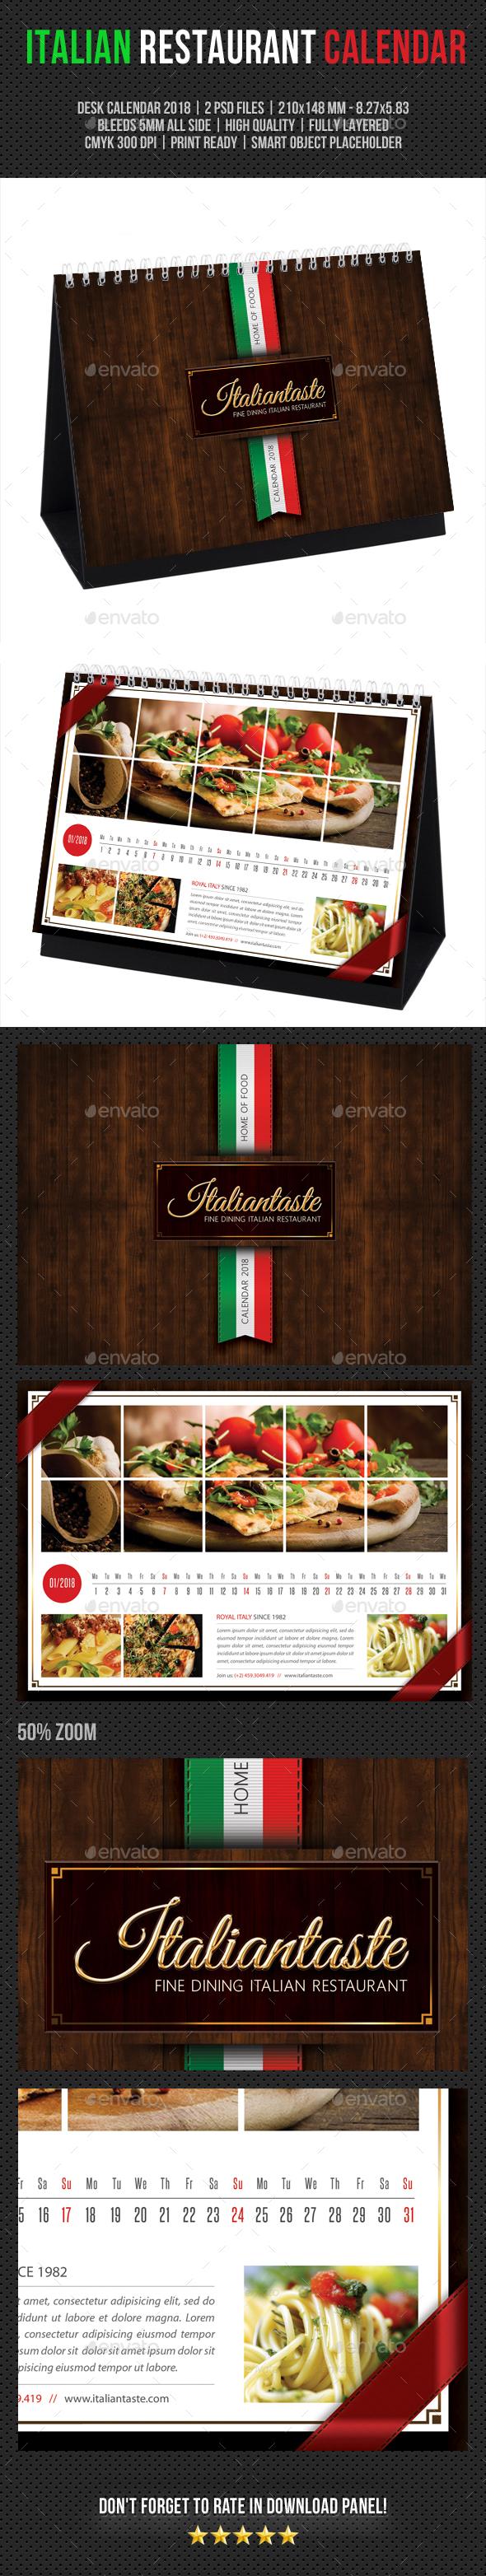 Italian Restaurant Desk Calendar 2018 - Calendars Stationery